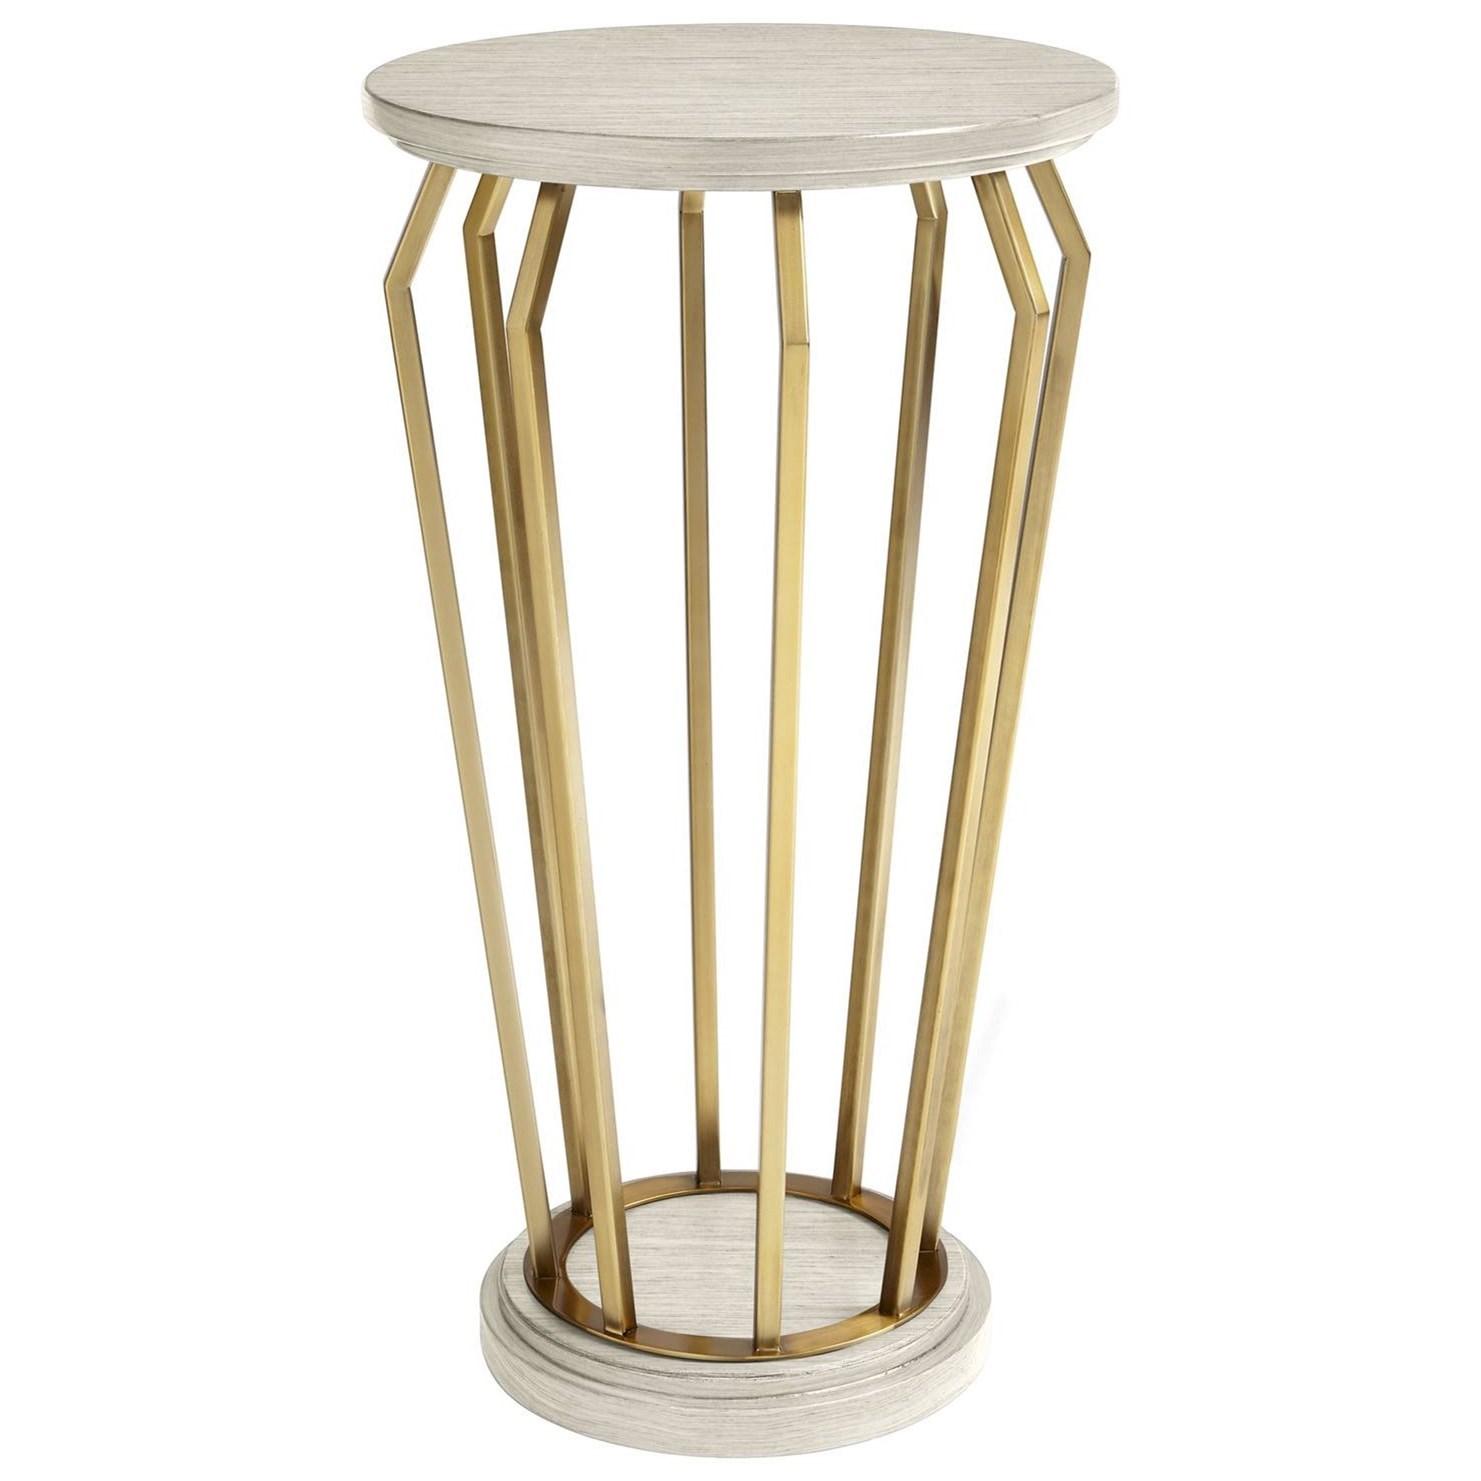 Stanley Furniture Coastal Living Oasis Manzanita Martini Table - Item Number: 527-55-16